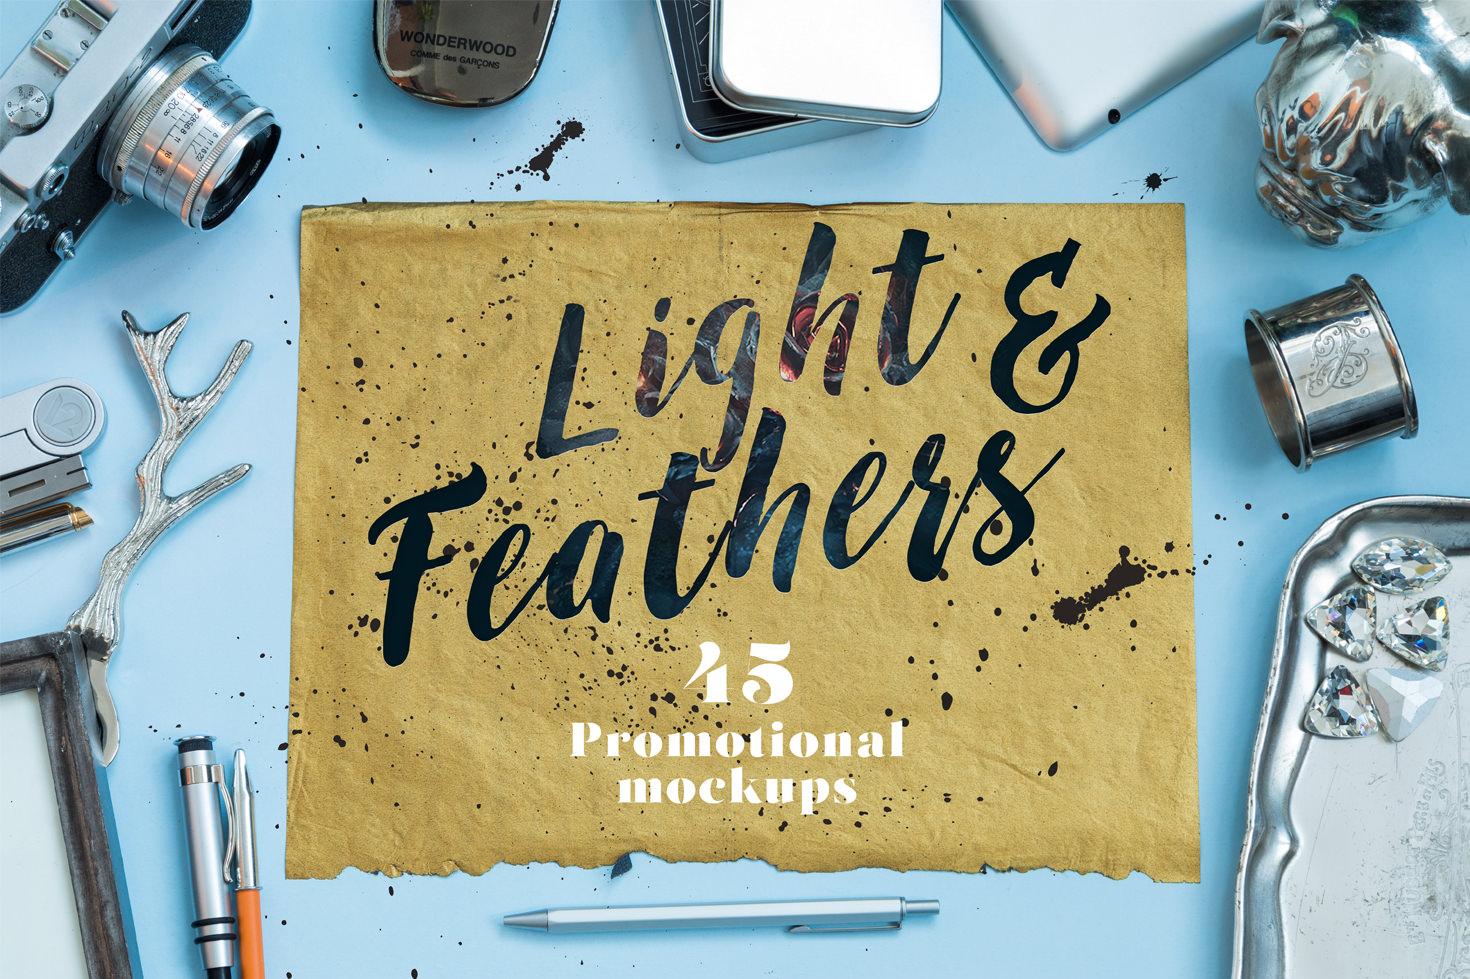 Light & Feathers - Promotional Mockups